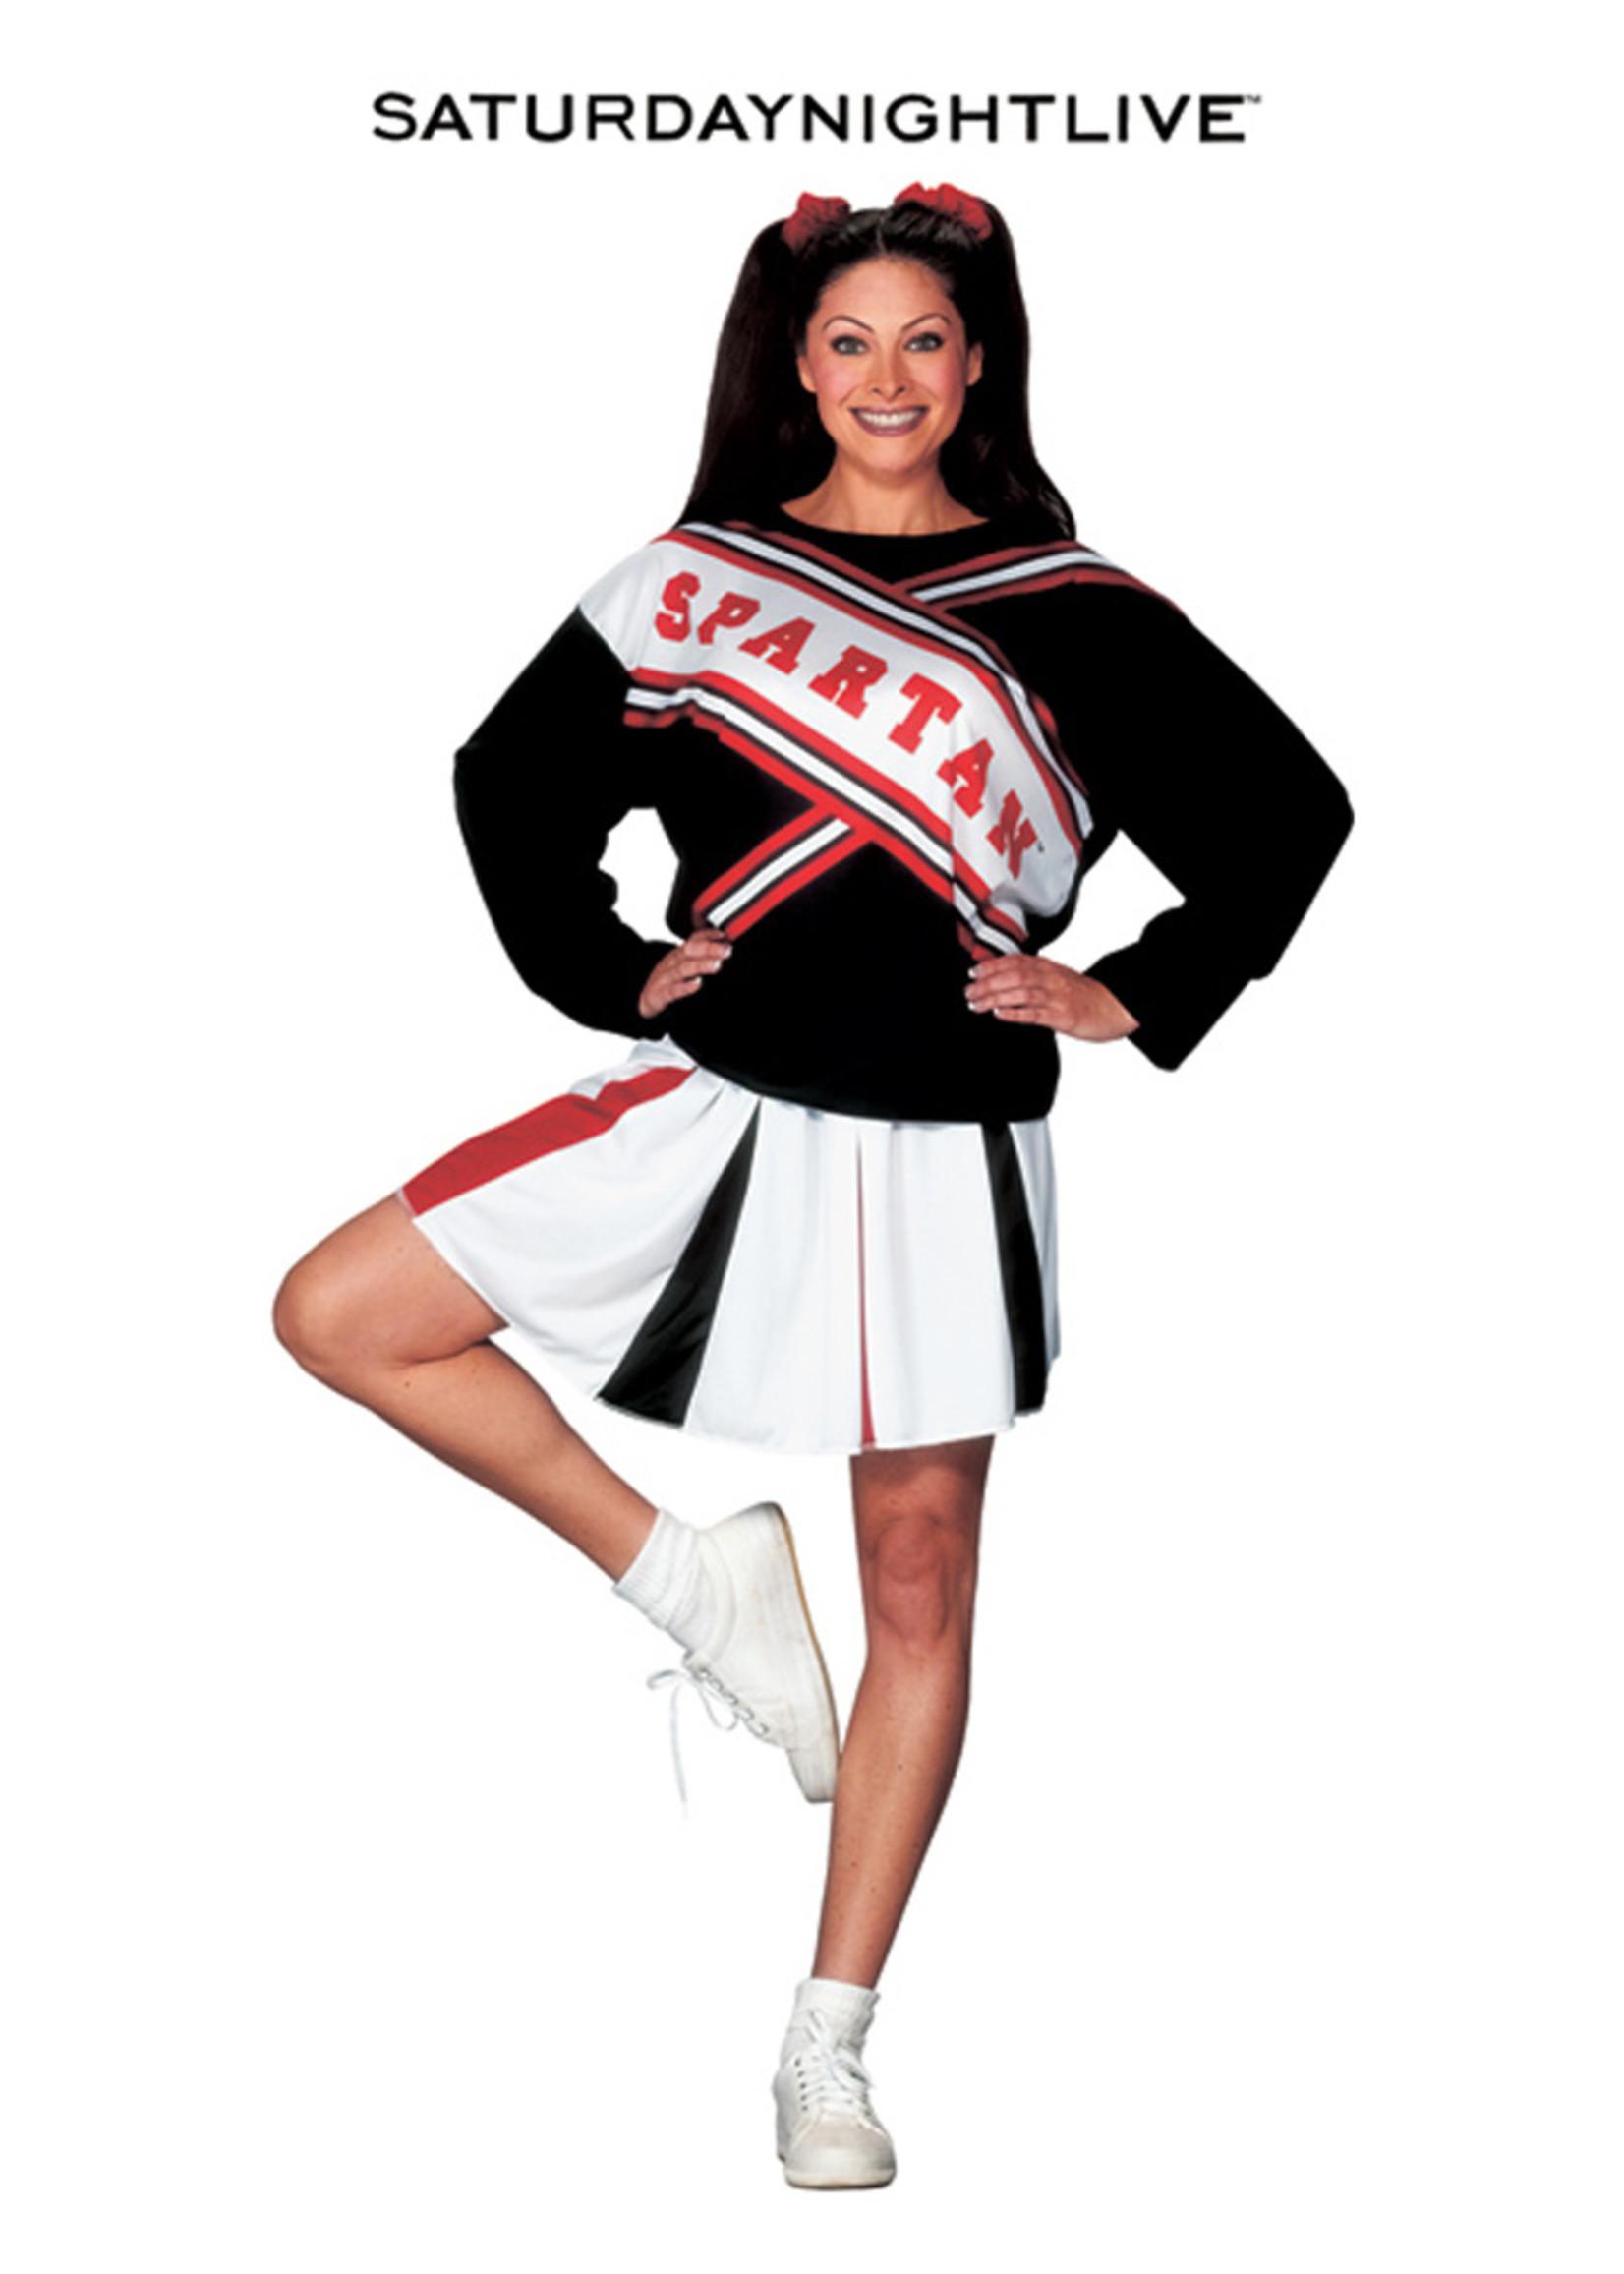 Spartan Cheerleader Costume - Women's